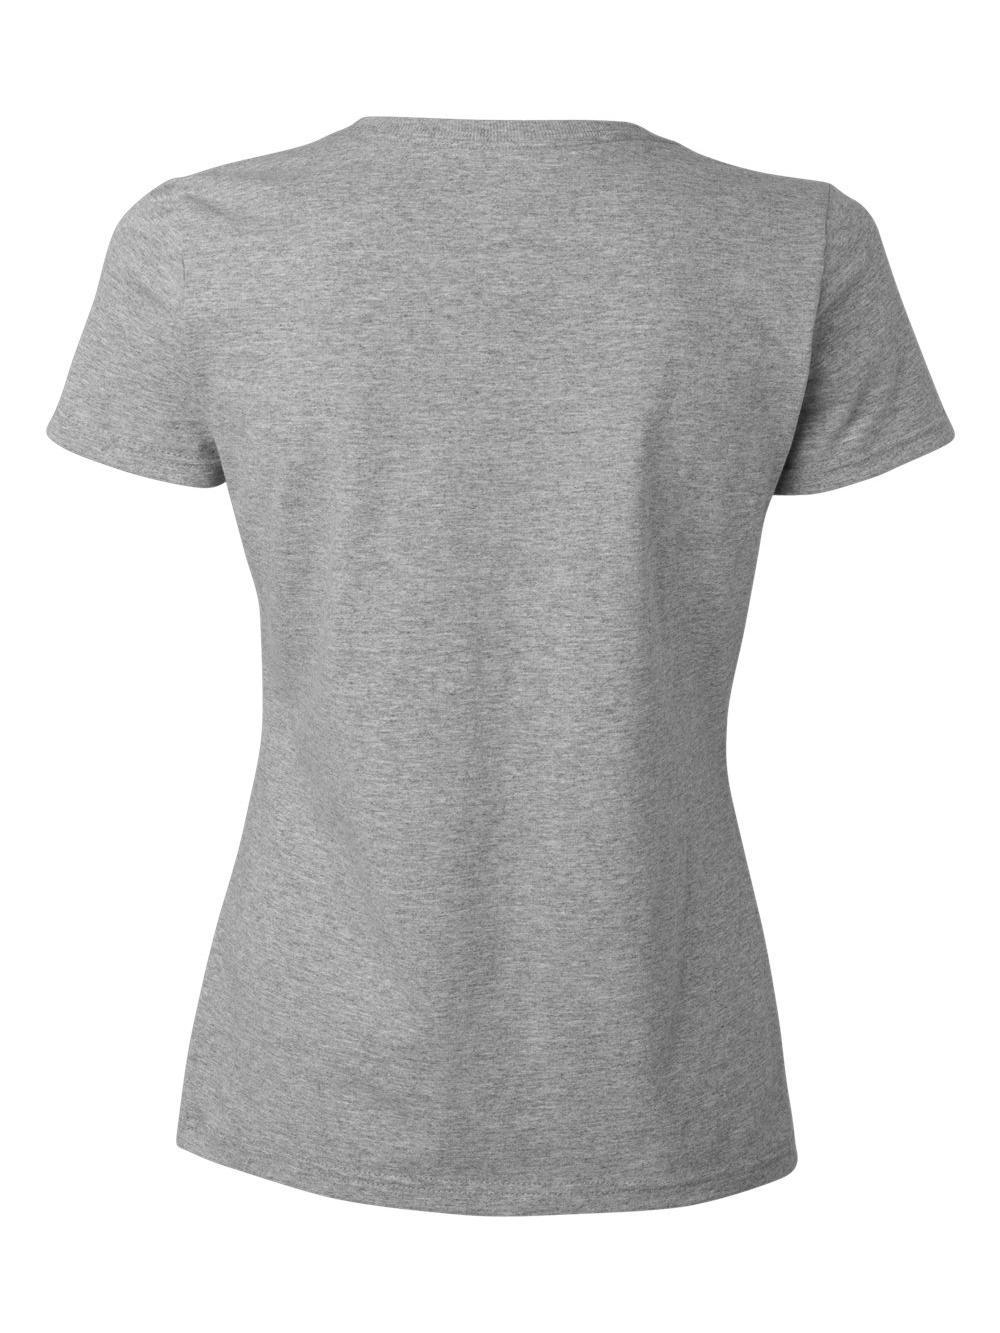 Fruit-of-the-Loom-HD-Cotton-Women-039-s-Short-Sleeve-T-Shirt-L3930R thumbnail 4